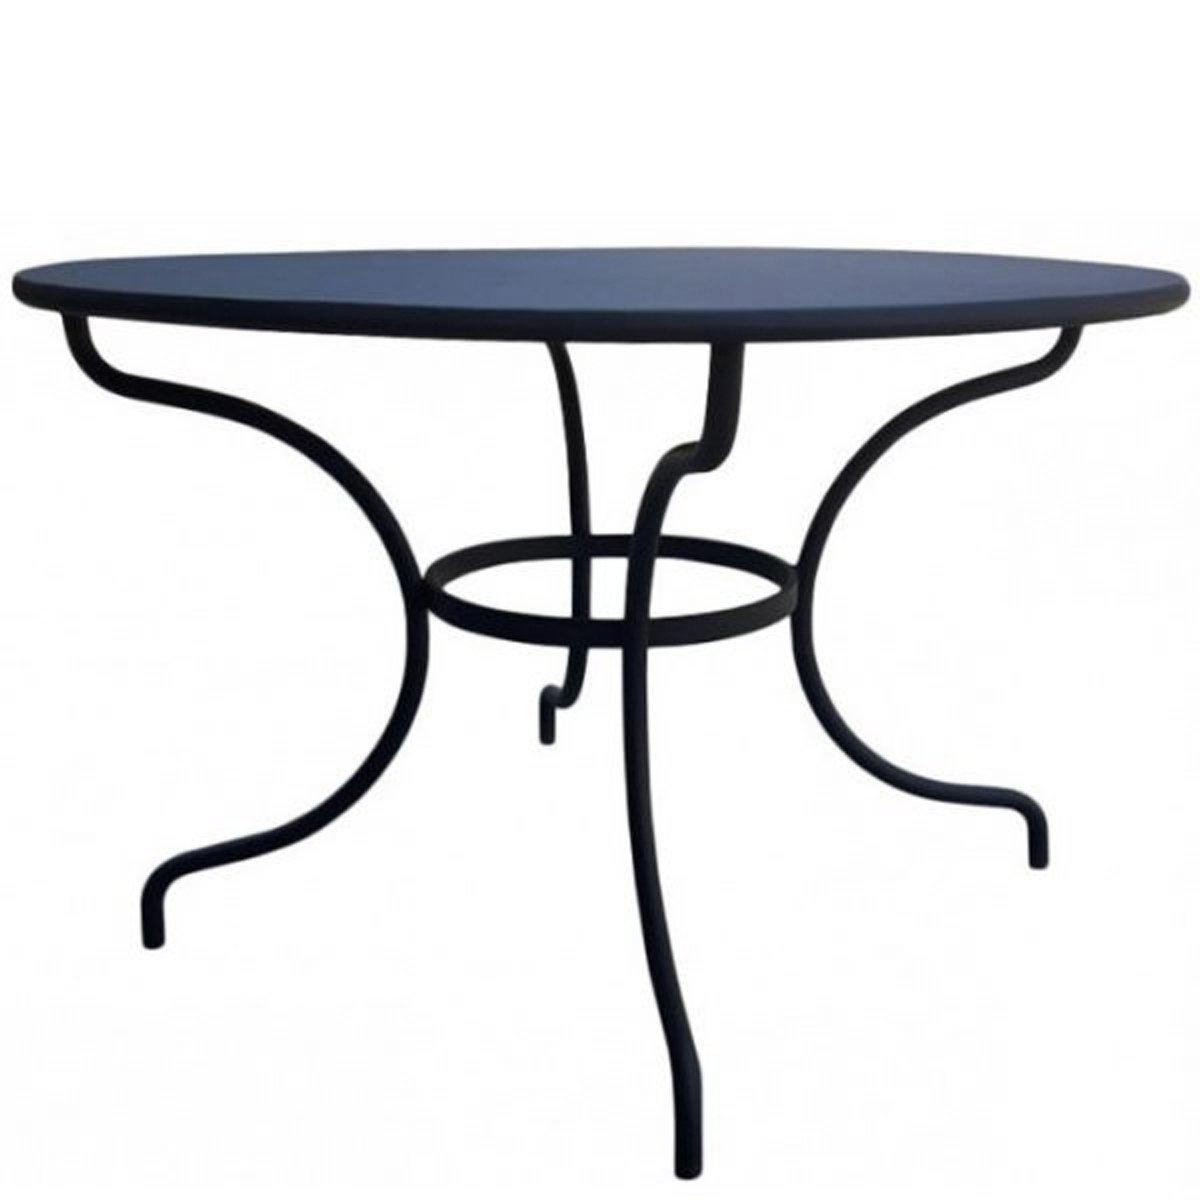 Metal Chairs Metal Furniture (View 7 of 30)